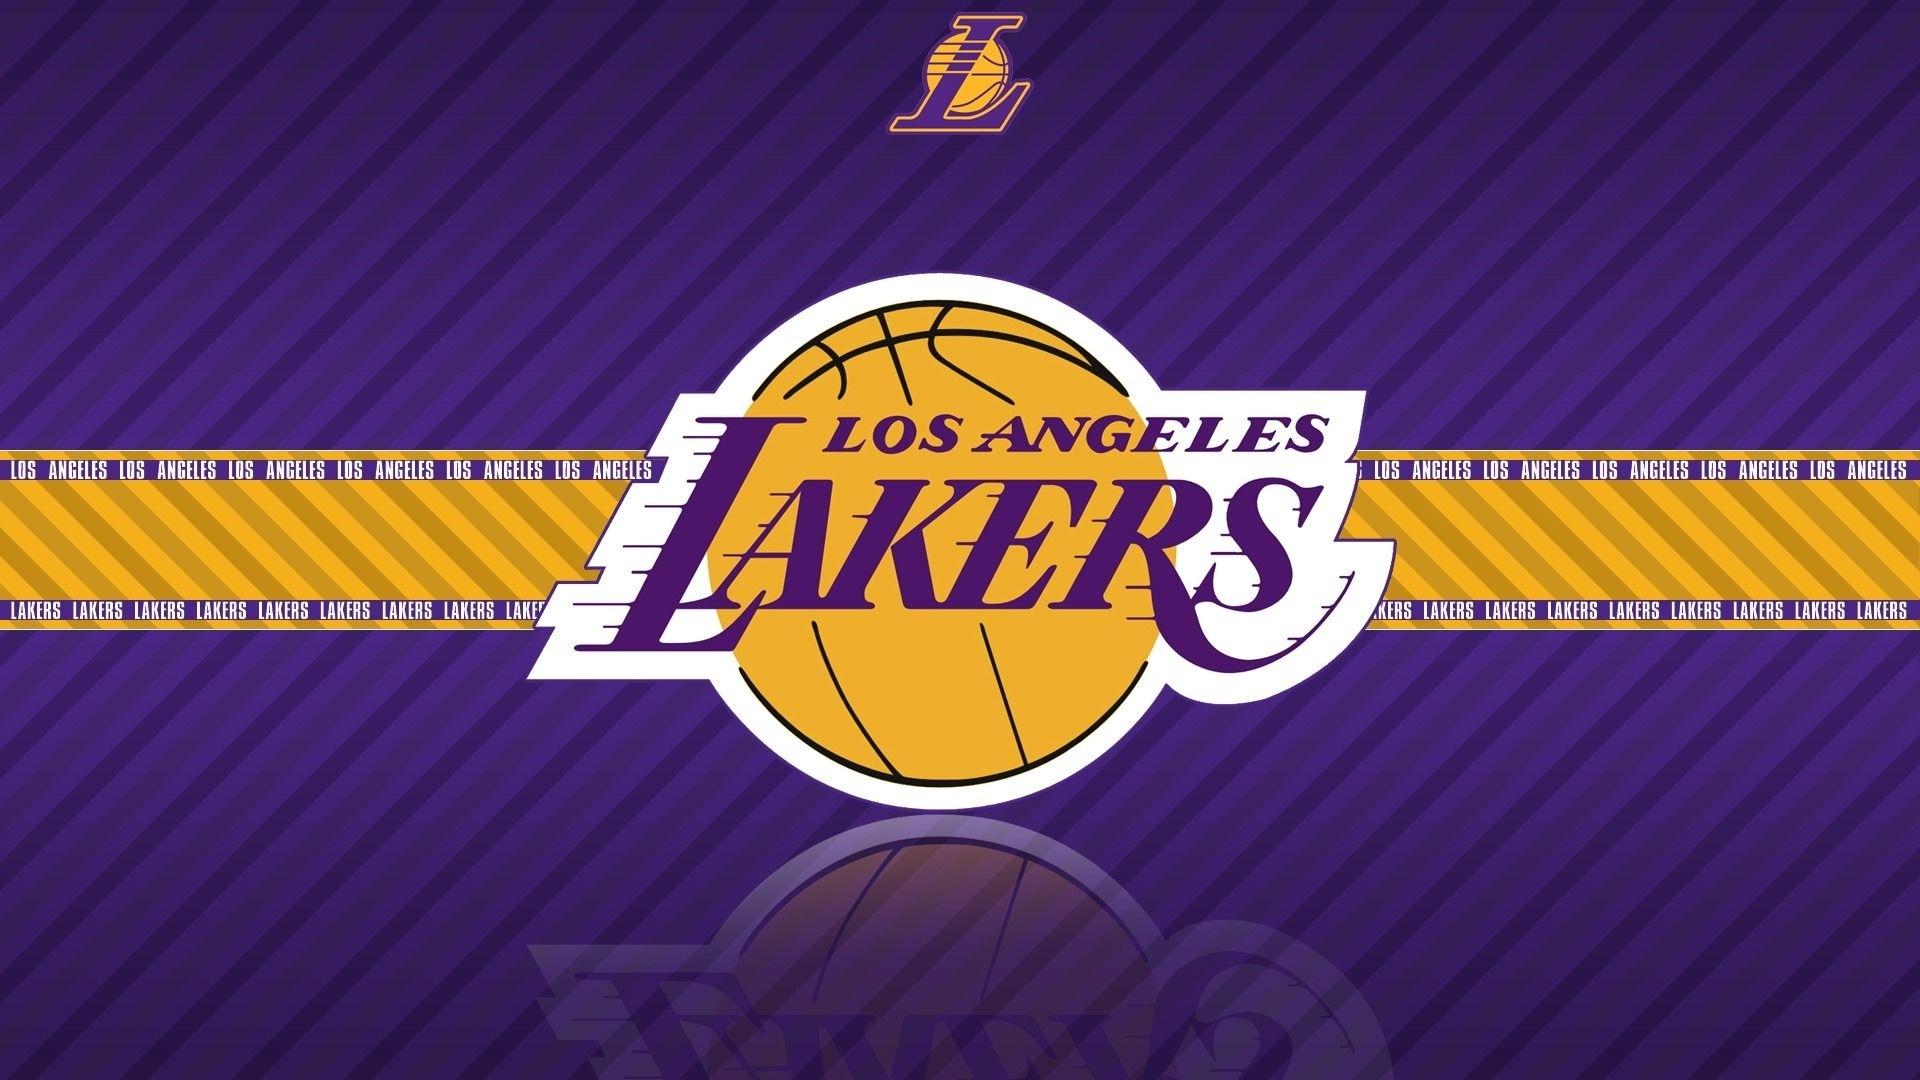 nba los angeles lakers team logo hd purple wallpaper widescreen